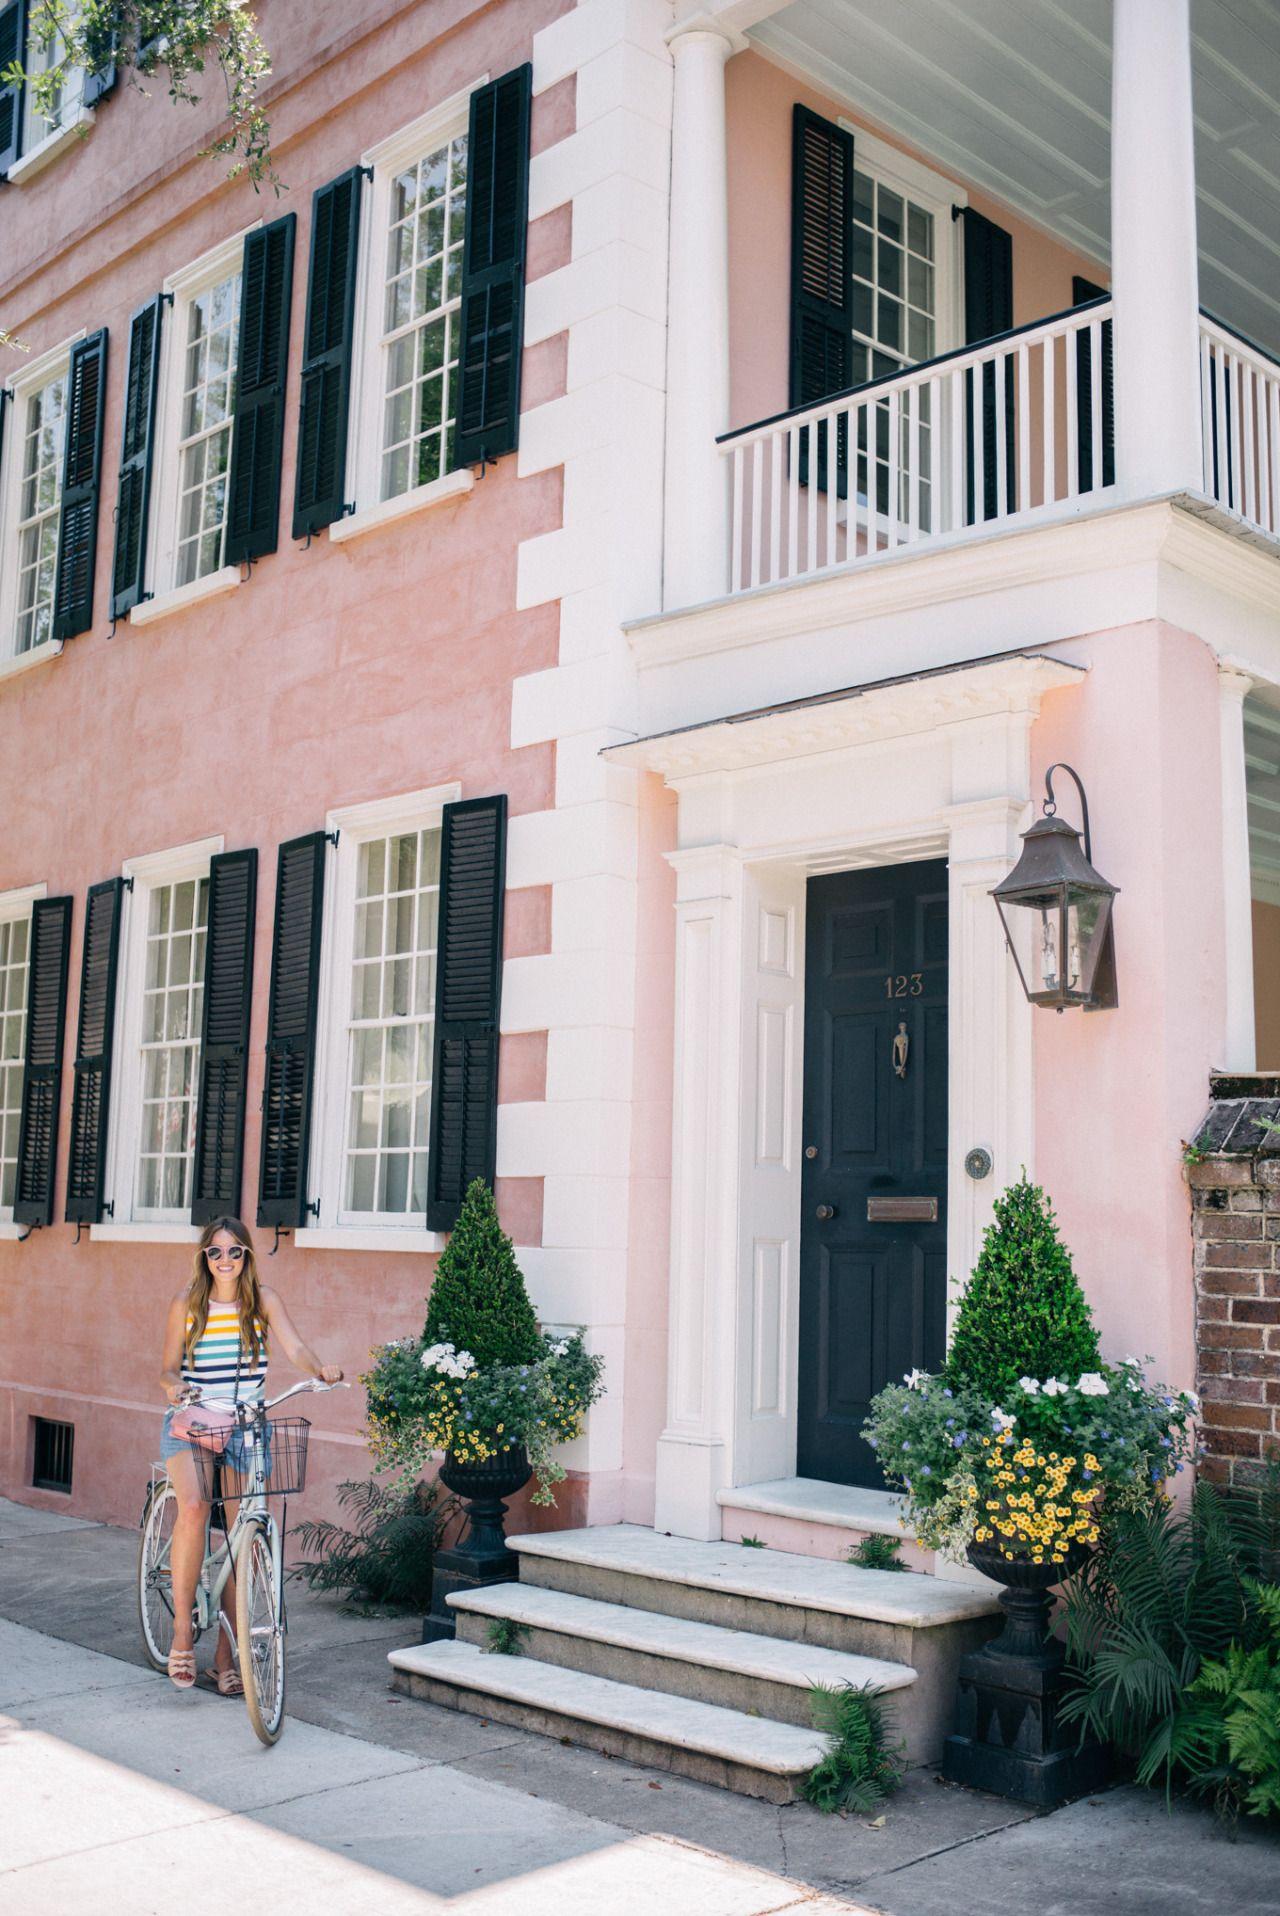 charleston home design%0A Personalized Photo Charms Compatible with Pandora Bracelets  Biking around  beautiful Charleston  SC